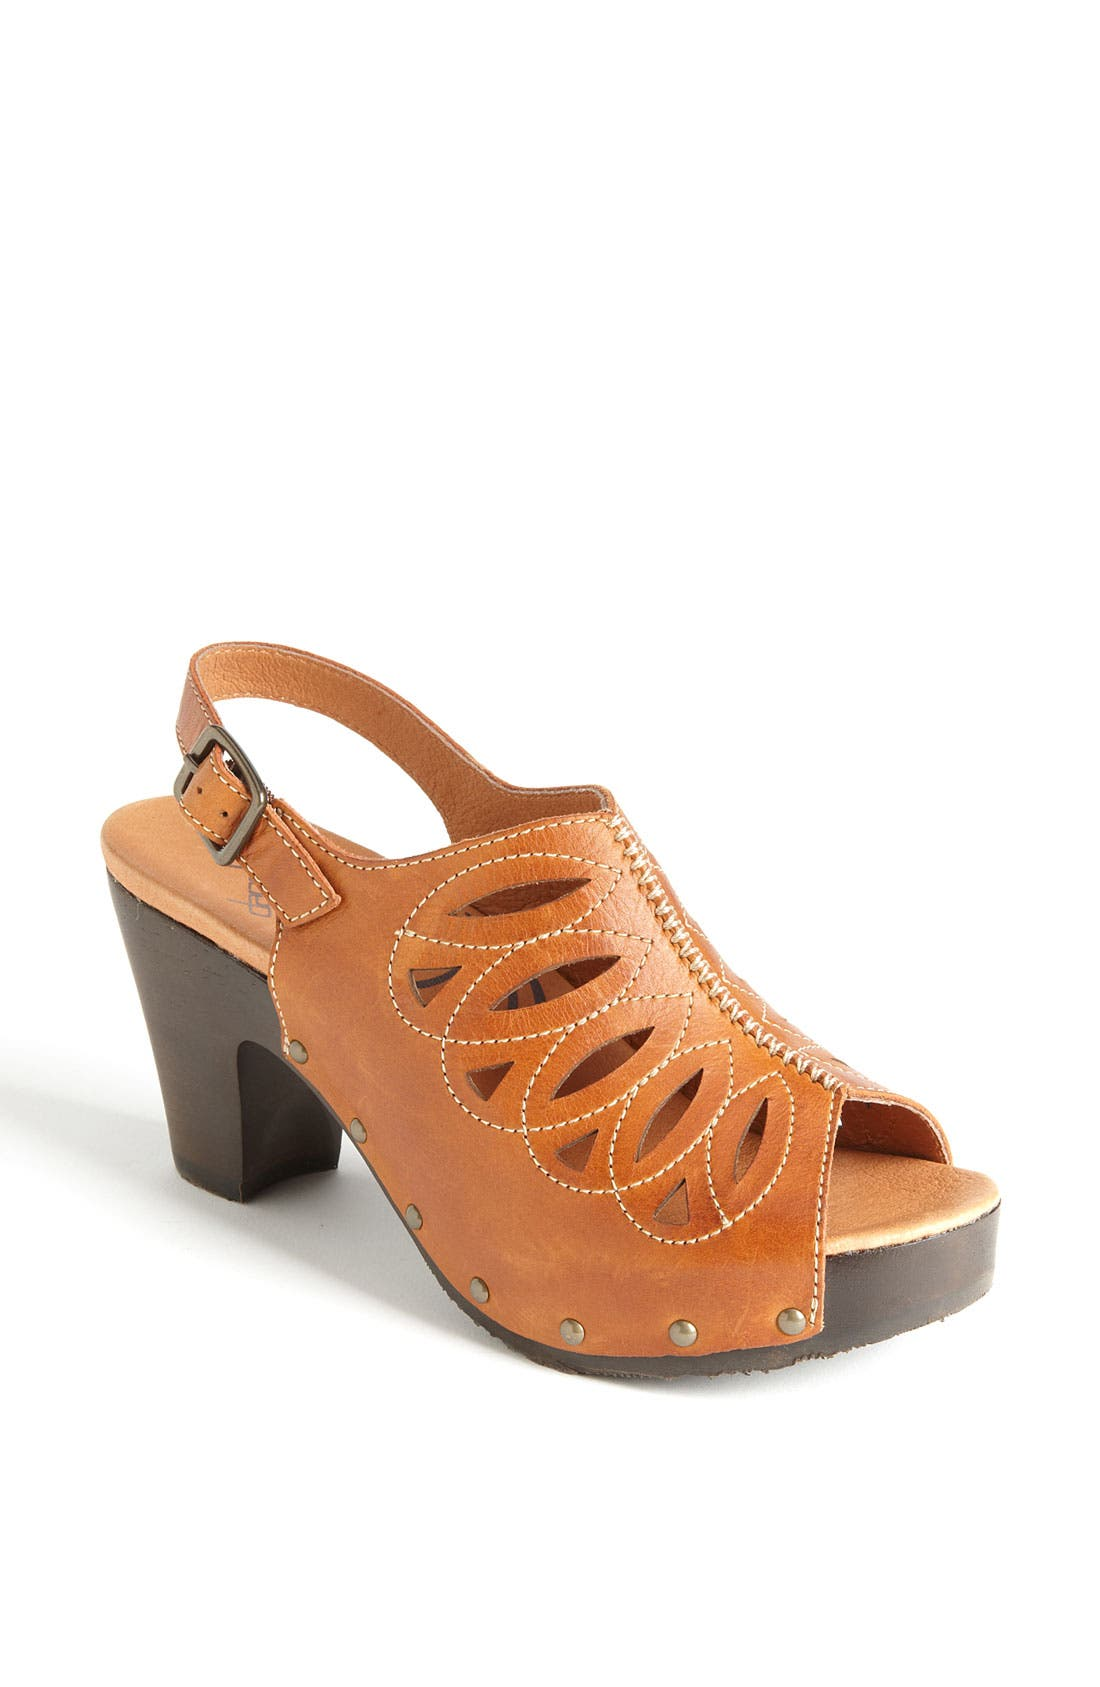 Alternate Image 1 Selected - Dansko 'Rowena' Clog Sandal